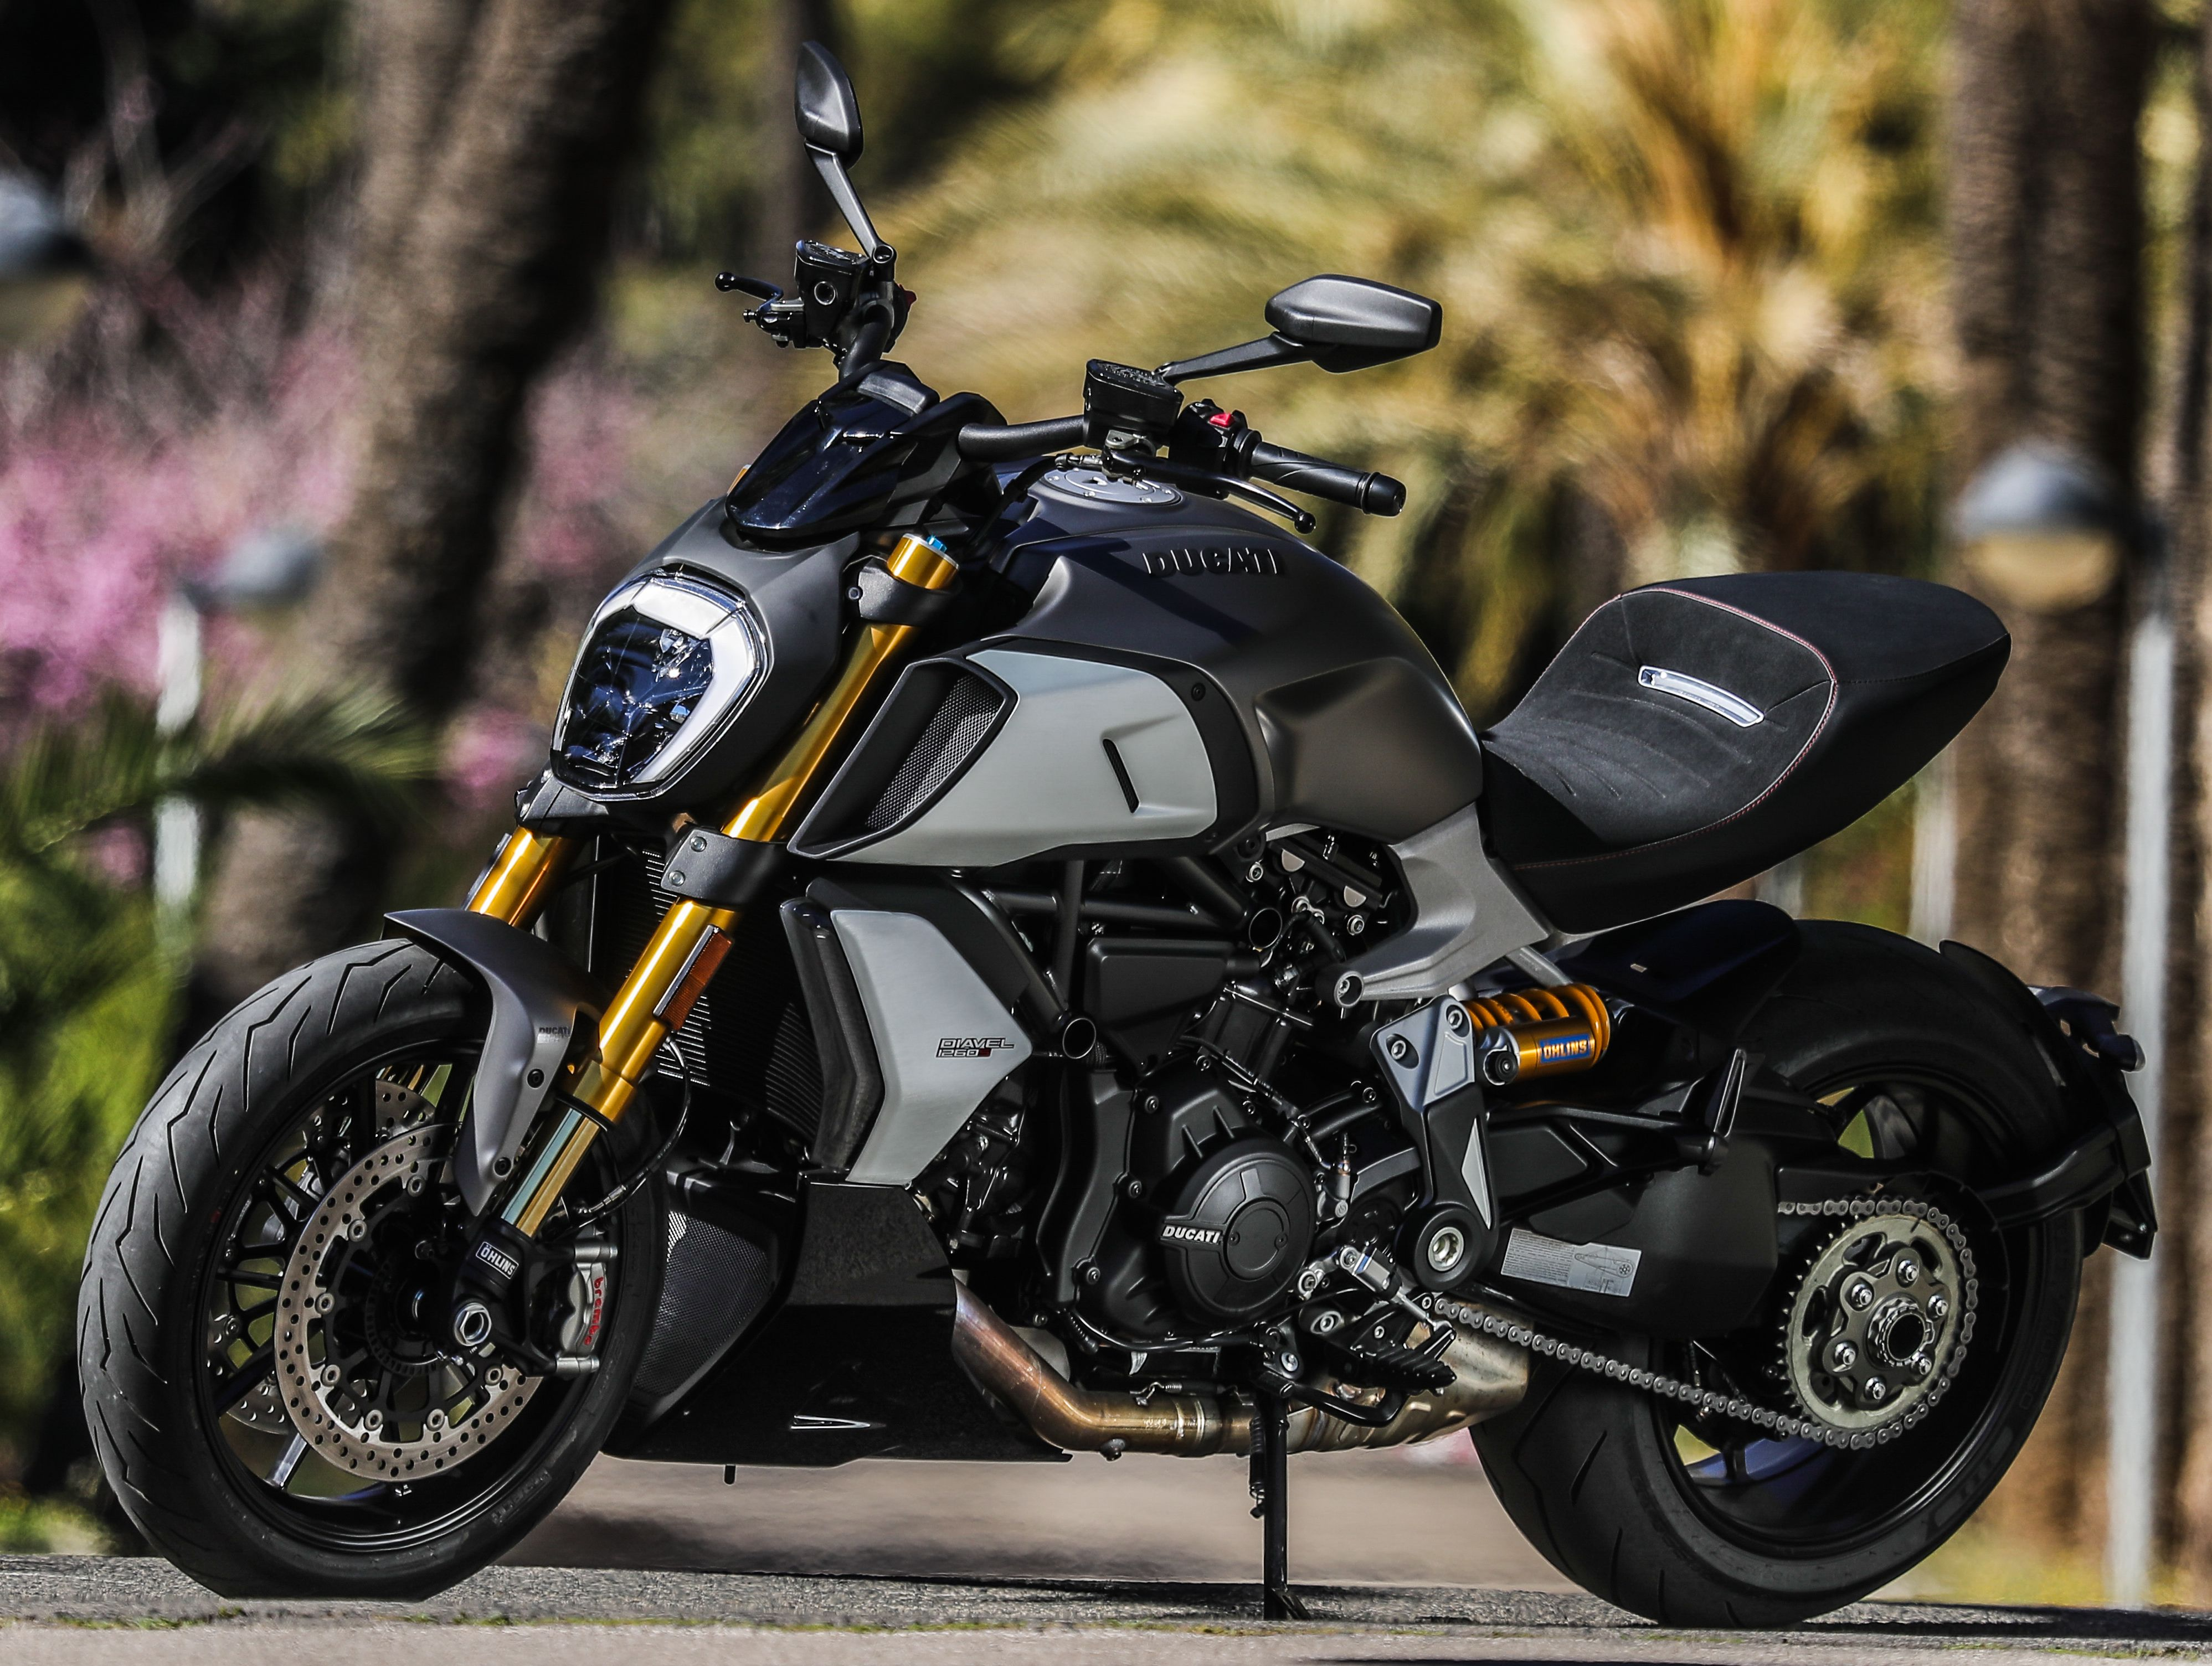 2019 Ducati Diavel 1260S Guide • Total Motorcycle